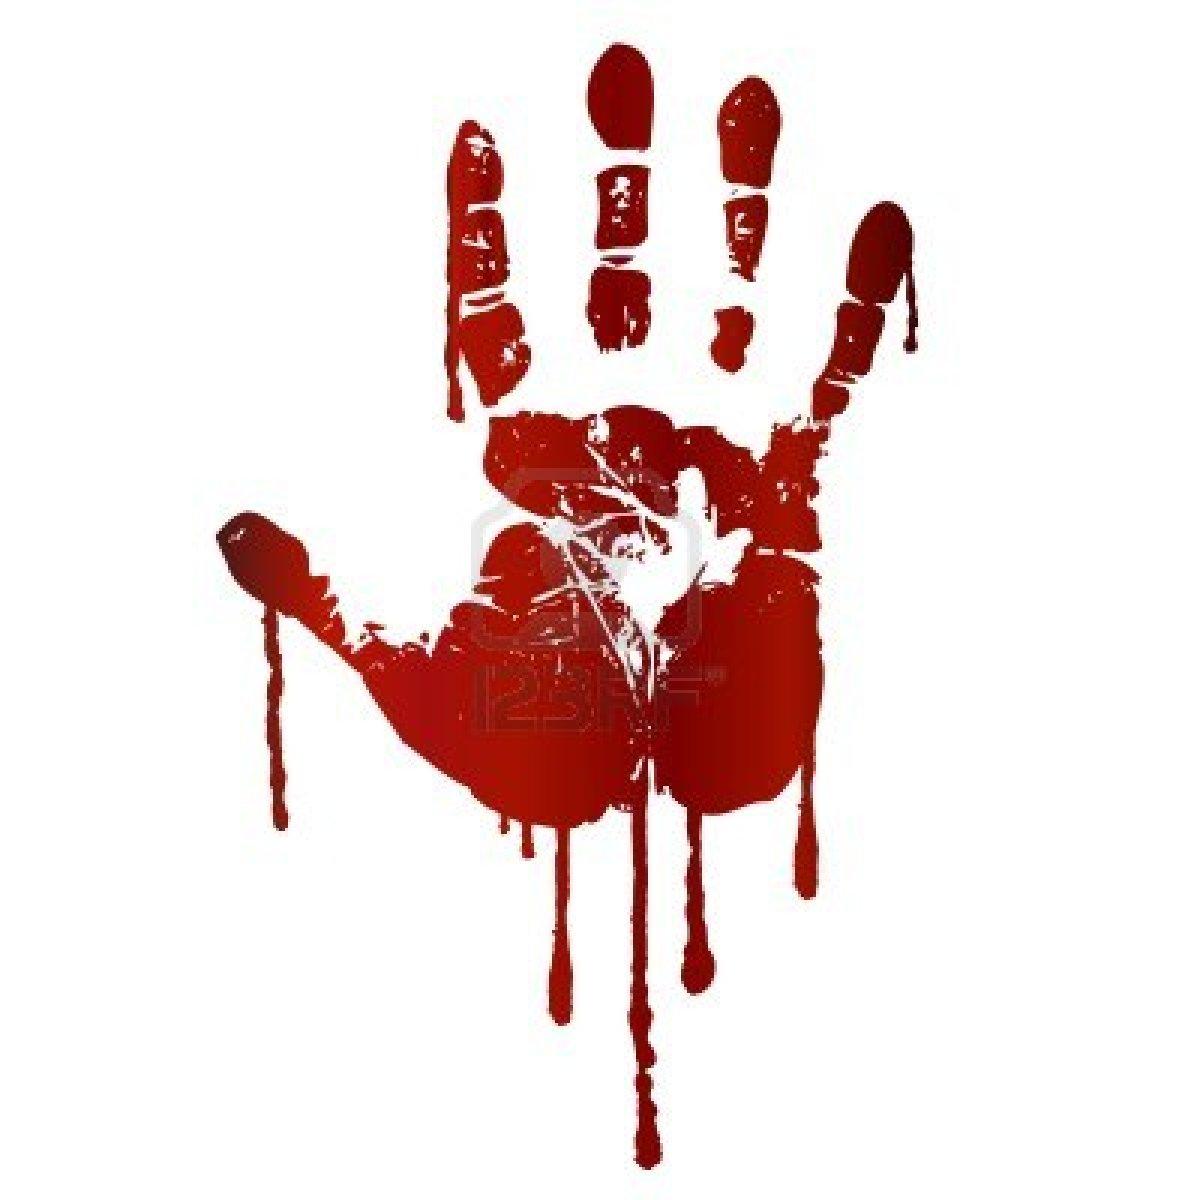 Blood Splatter Hand Clipart - Clipart Kid